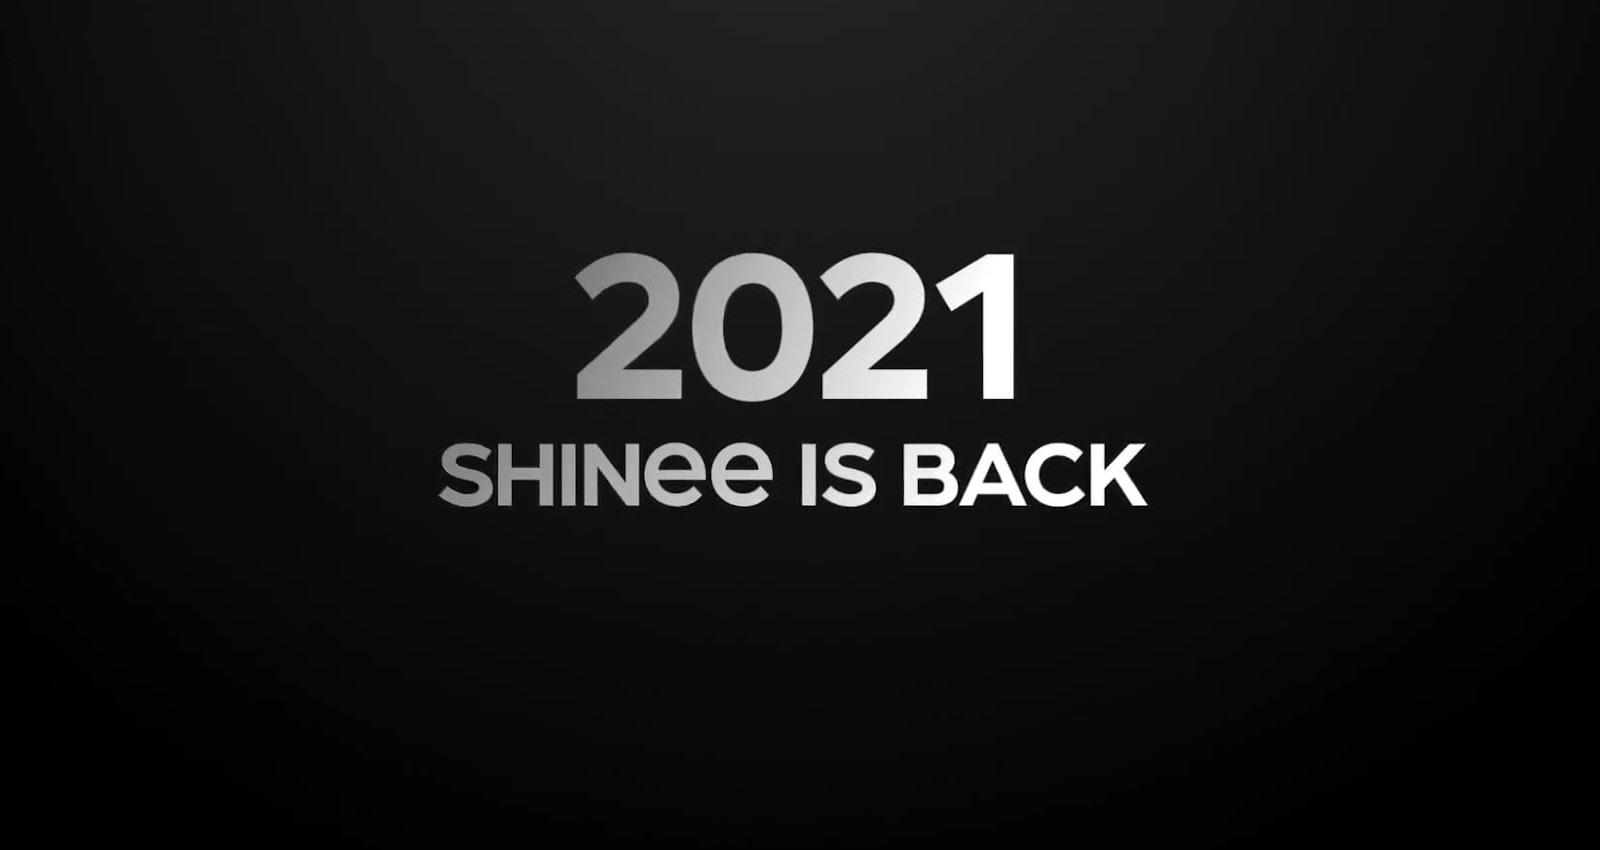 shinee is back 2021